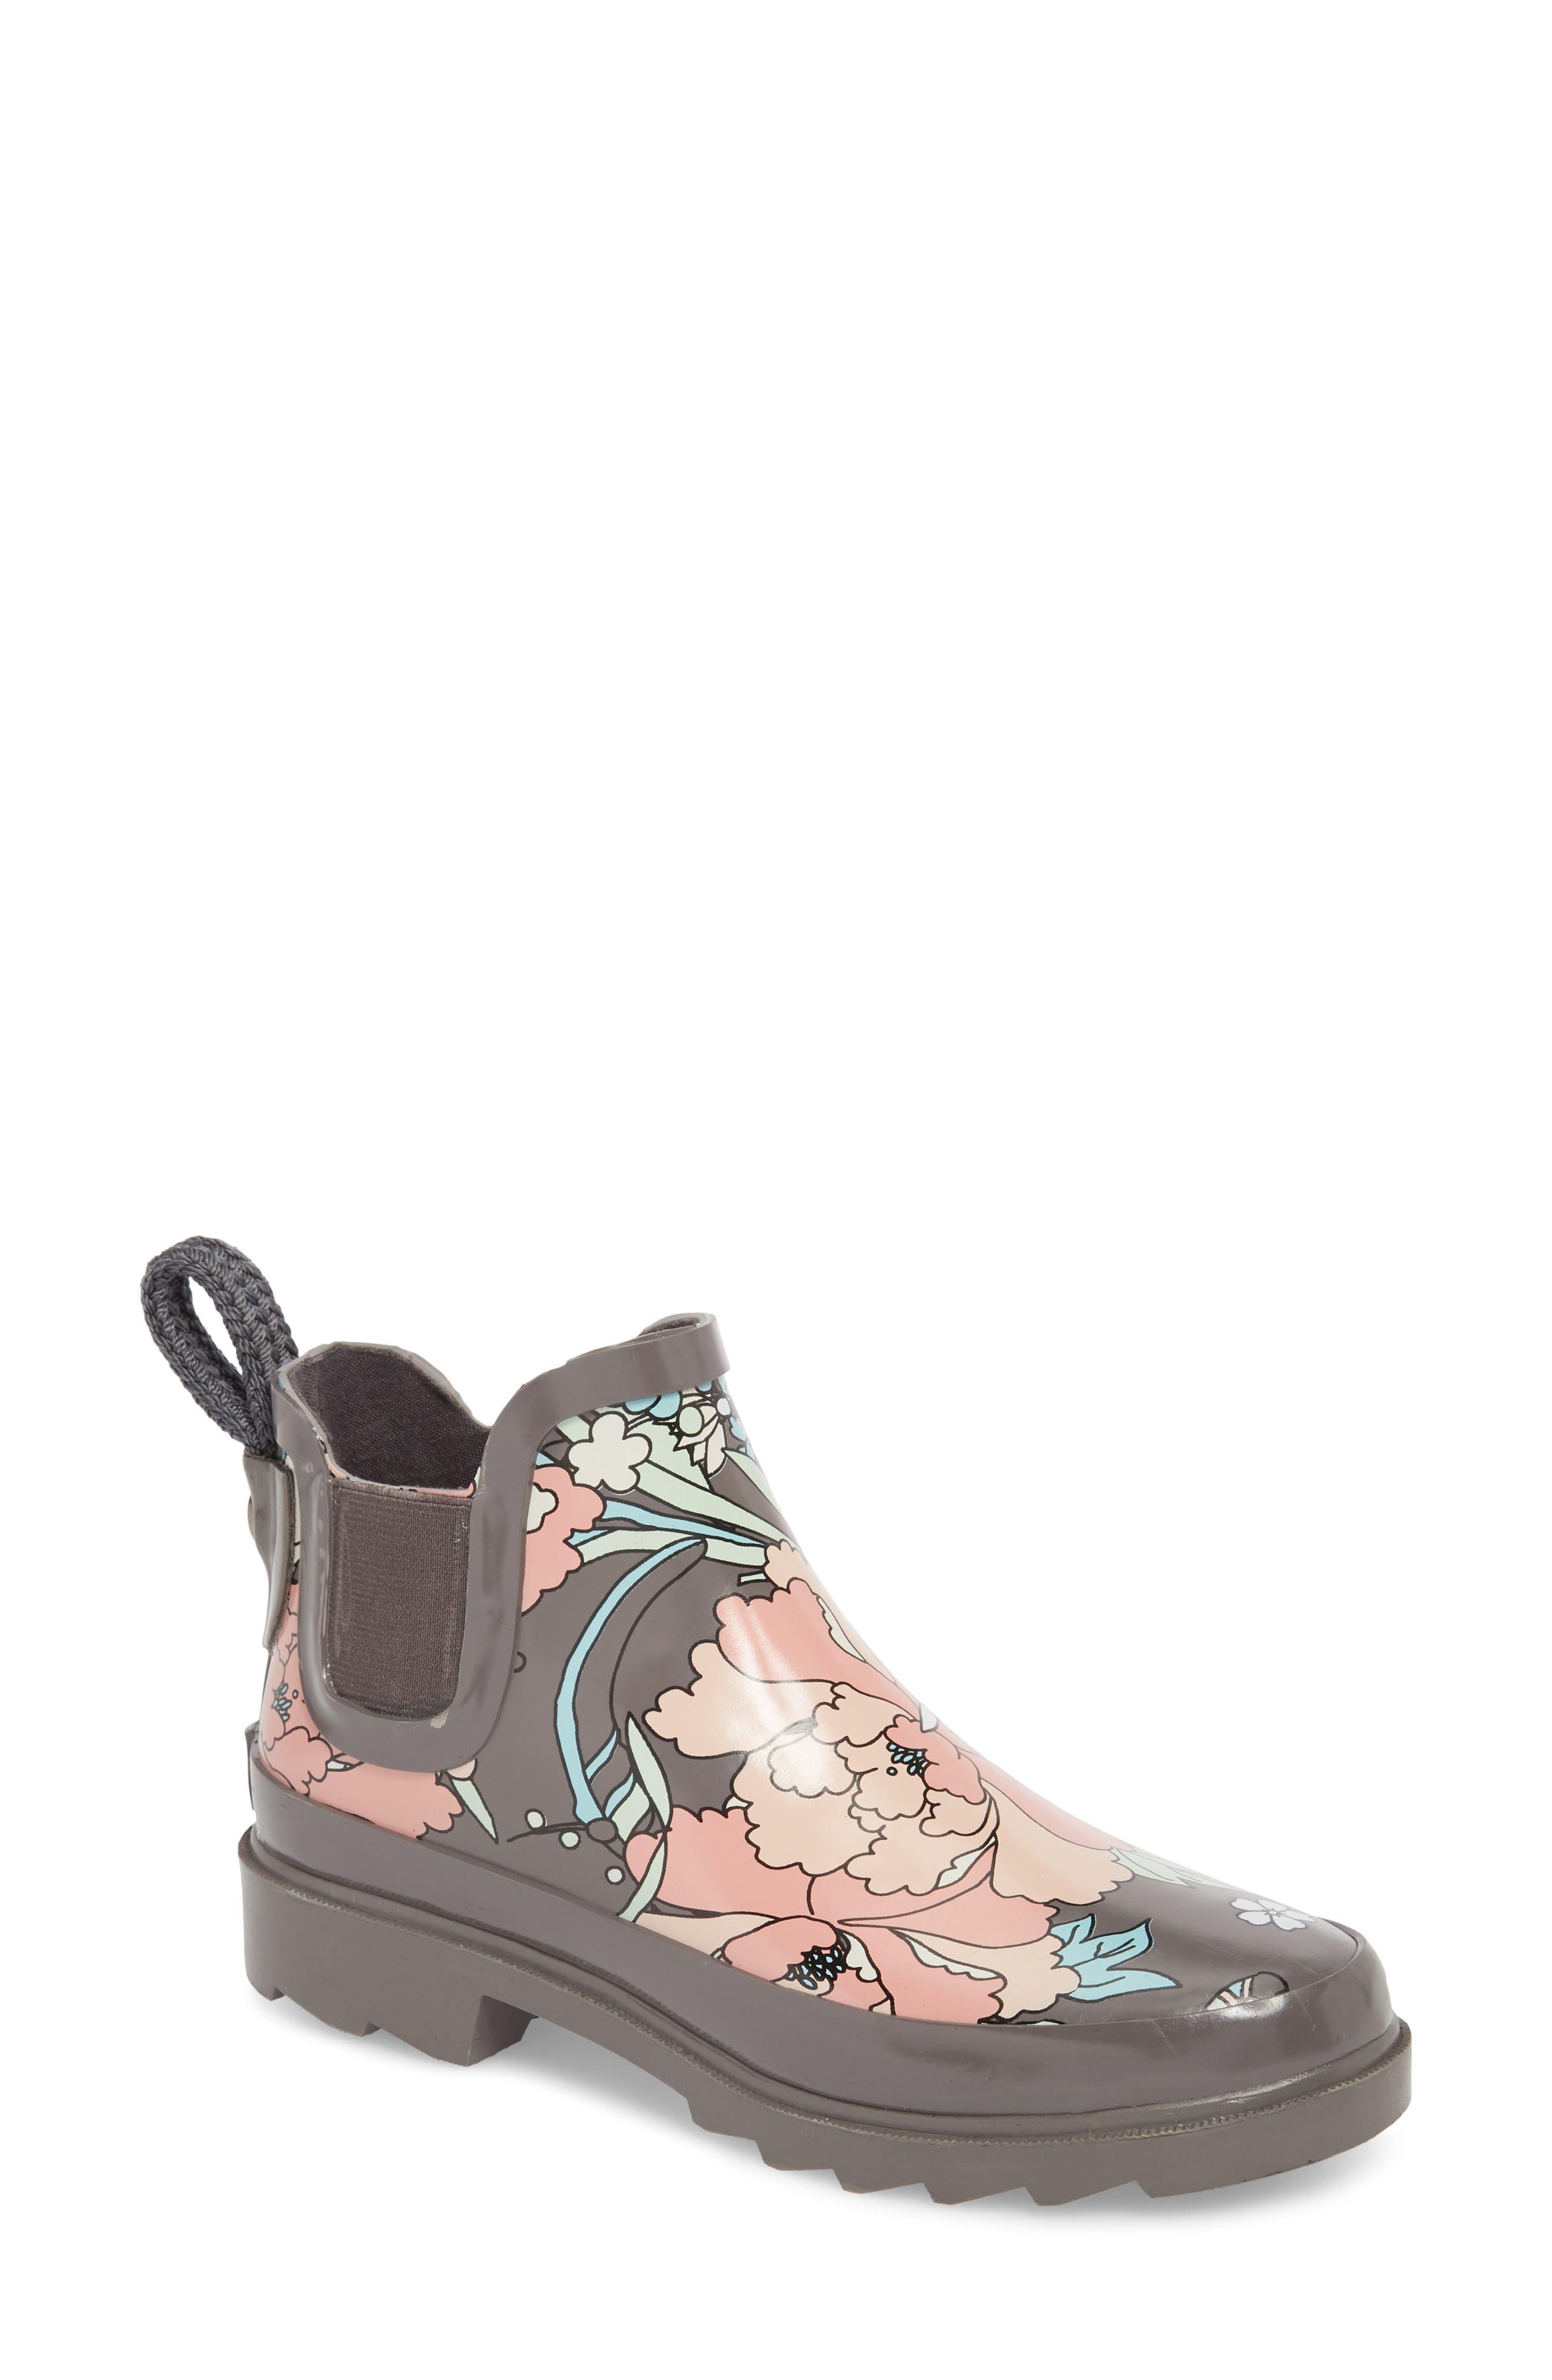 Rhyme Waterproof Rain Boot,                         Main,                         color, CHARCOAL FLOWER POWER